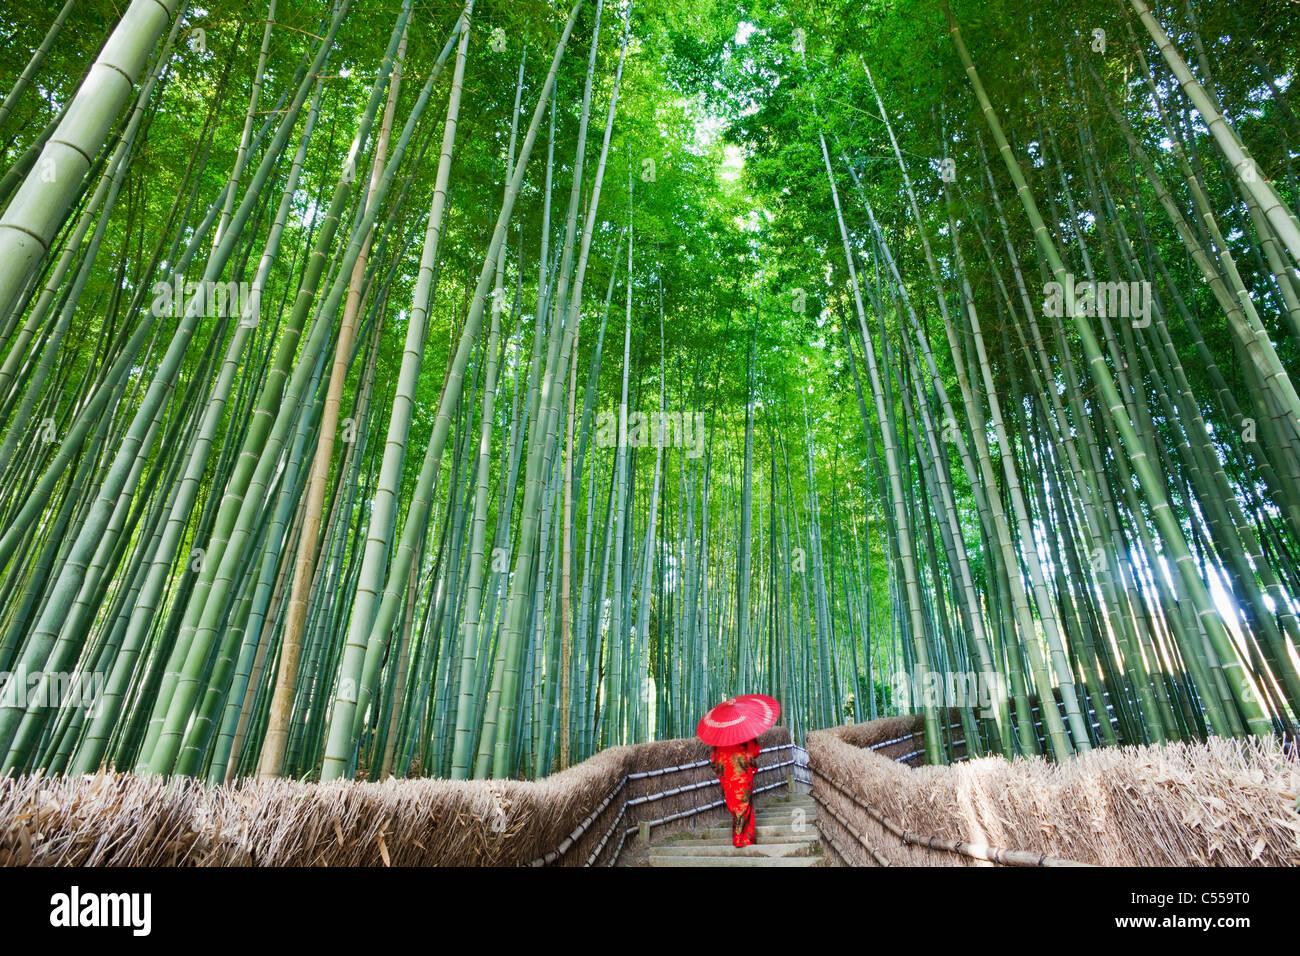 Femme marche dans une forêt de bambou, Adashino-nenbutsu-ji, Arashiyama, Kyoto Prefecture, Kinki Region, Honshu, Japan Banque D'Images